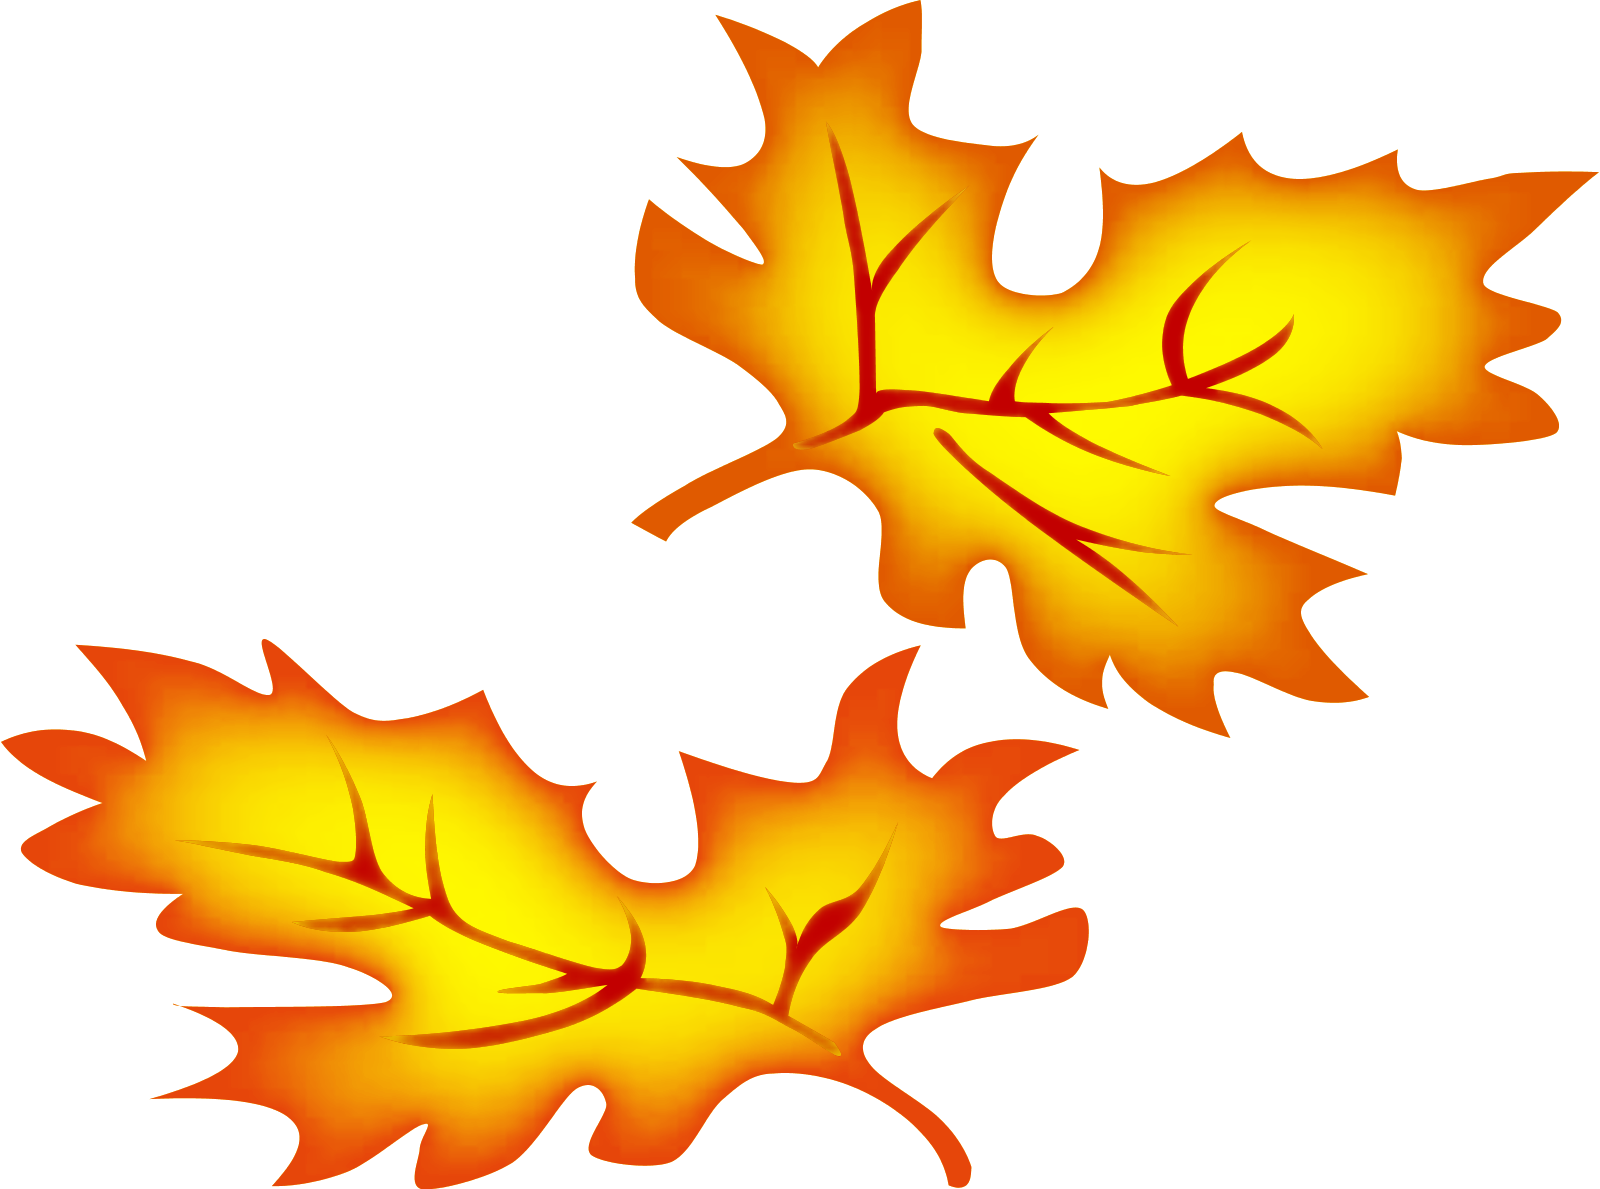 1600x1189 Fall Season Leaves Clipart